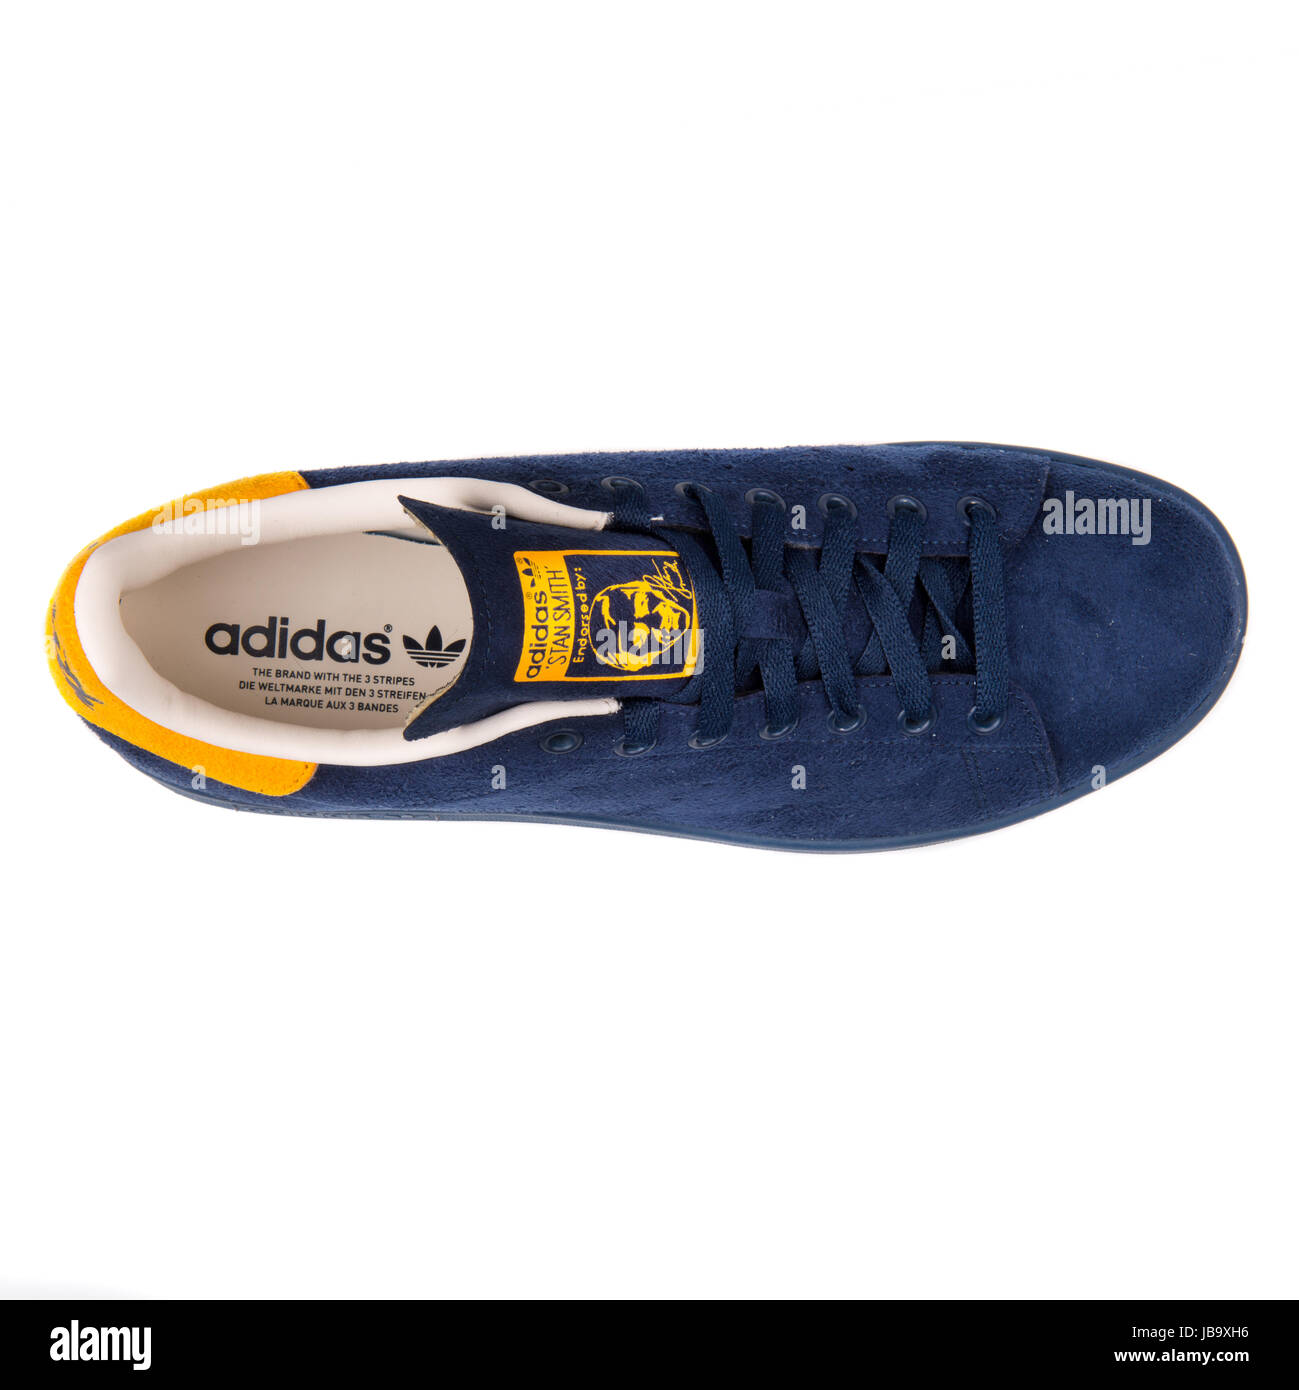 énorme réduction 54abc ba496 Stan Smith Sneaker Photos & Stan Smith Sneaker Images - Alamy